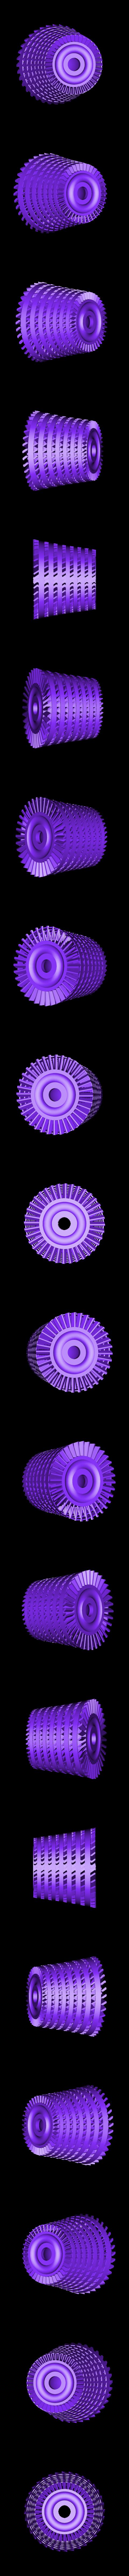 IPC-Rotor901ws.stl Download free STL file Jet Engine; 3-Spool, Modified Parts • Model to 3D print, konchan77